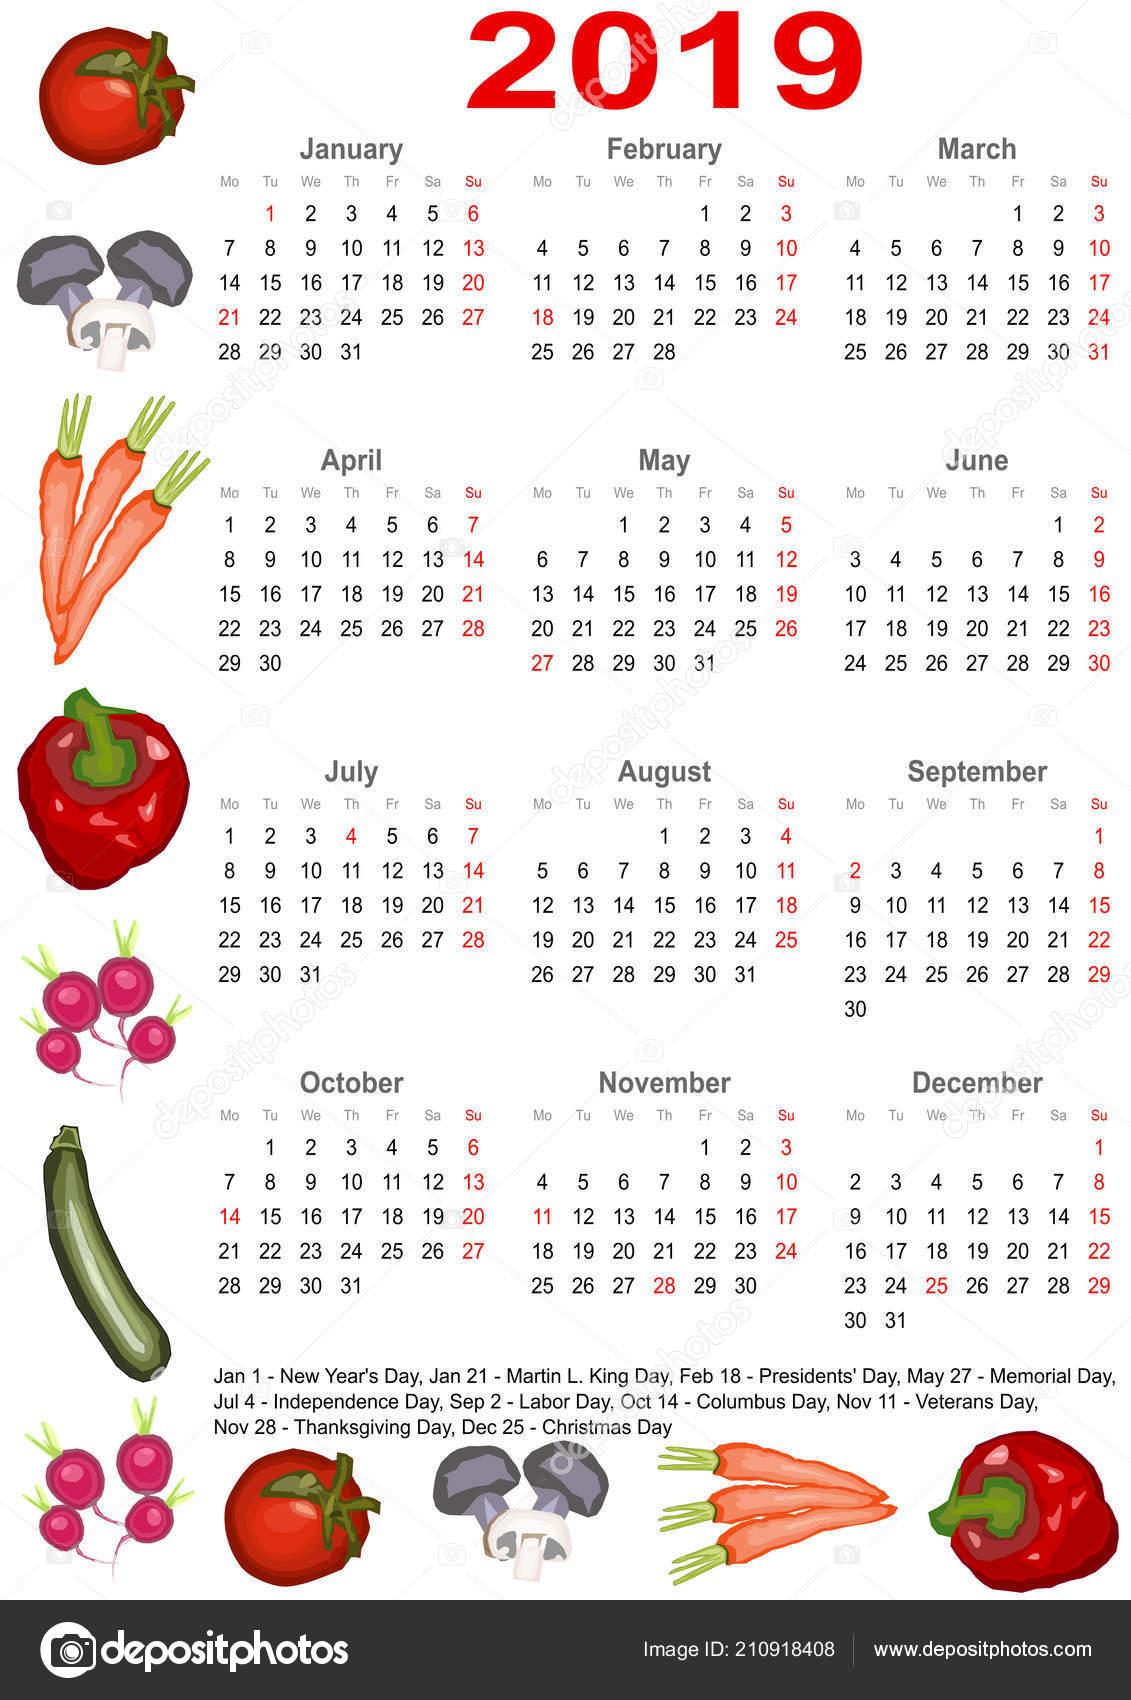 Calendar Illustration List : Calendar markings list public holidays usa edged